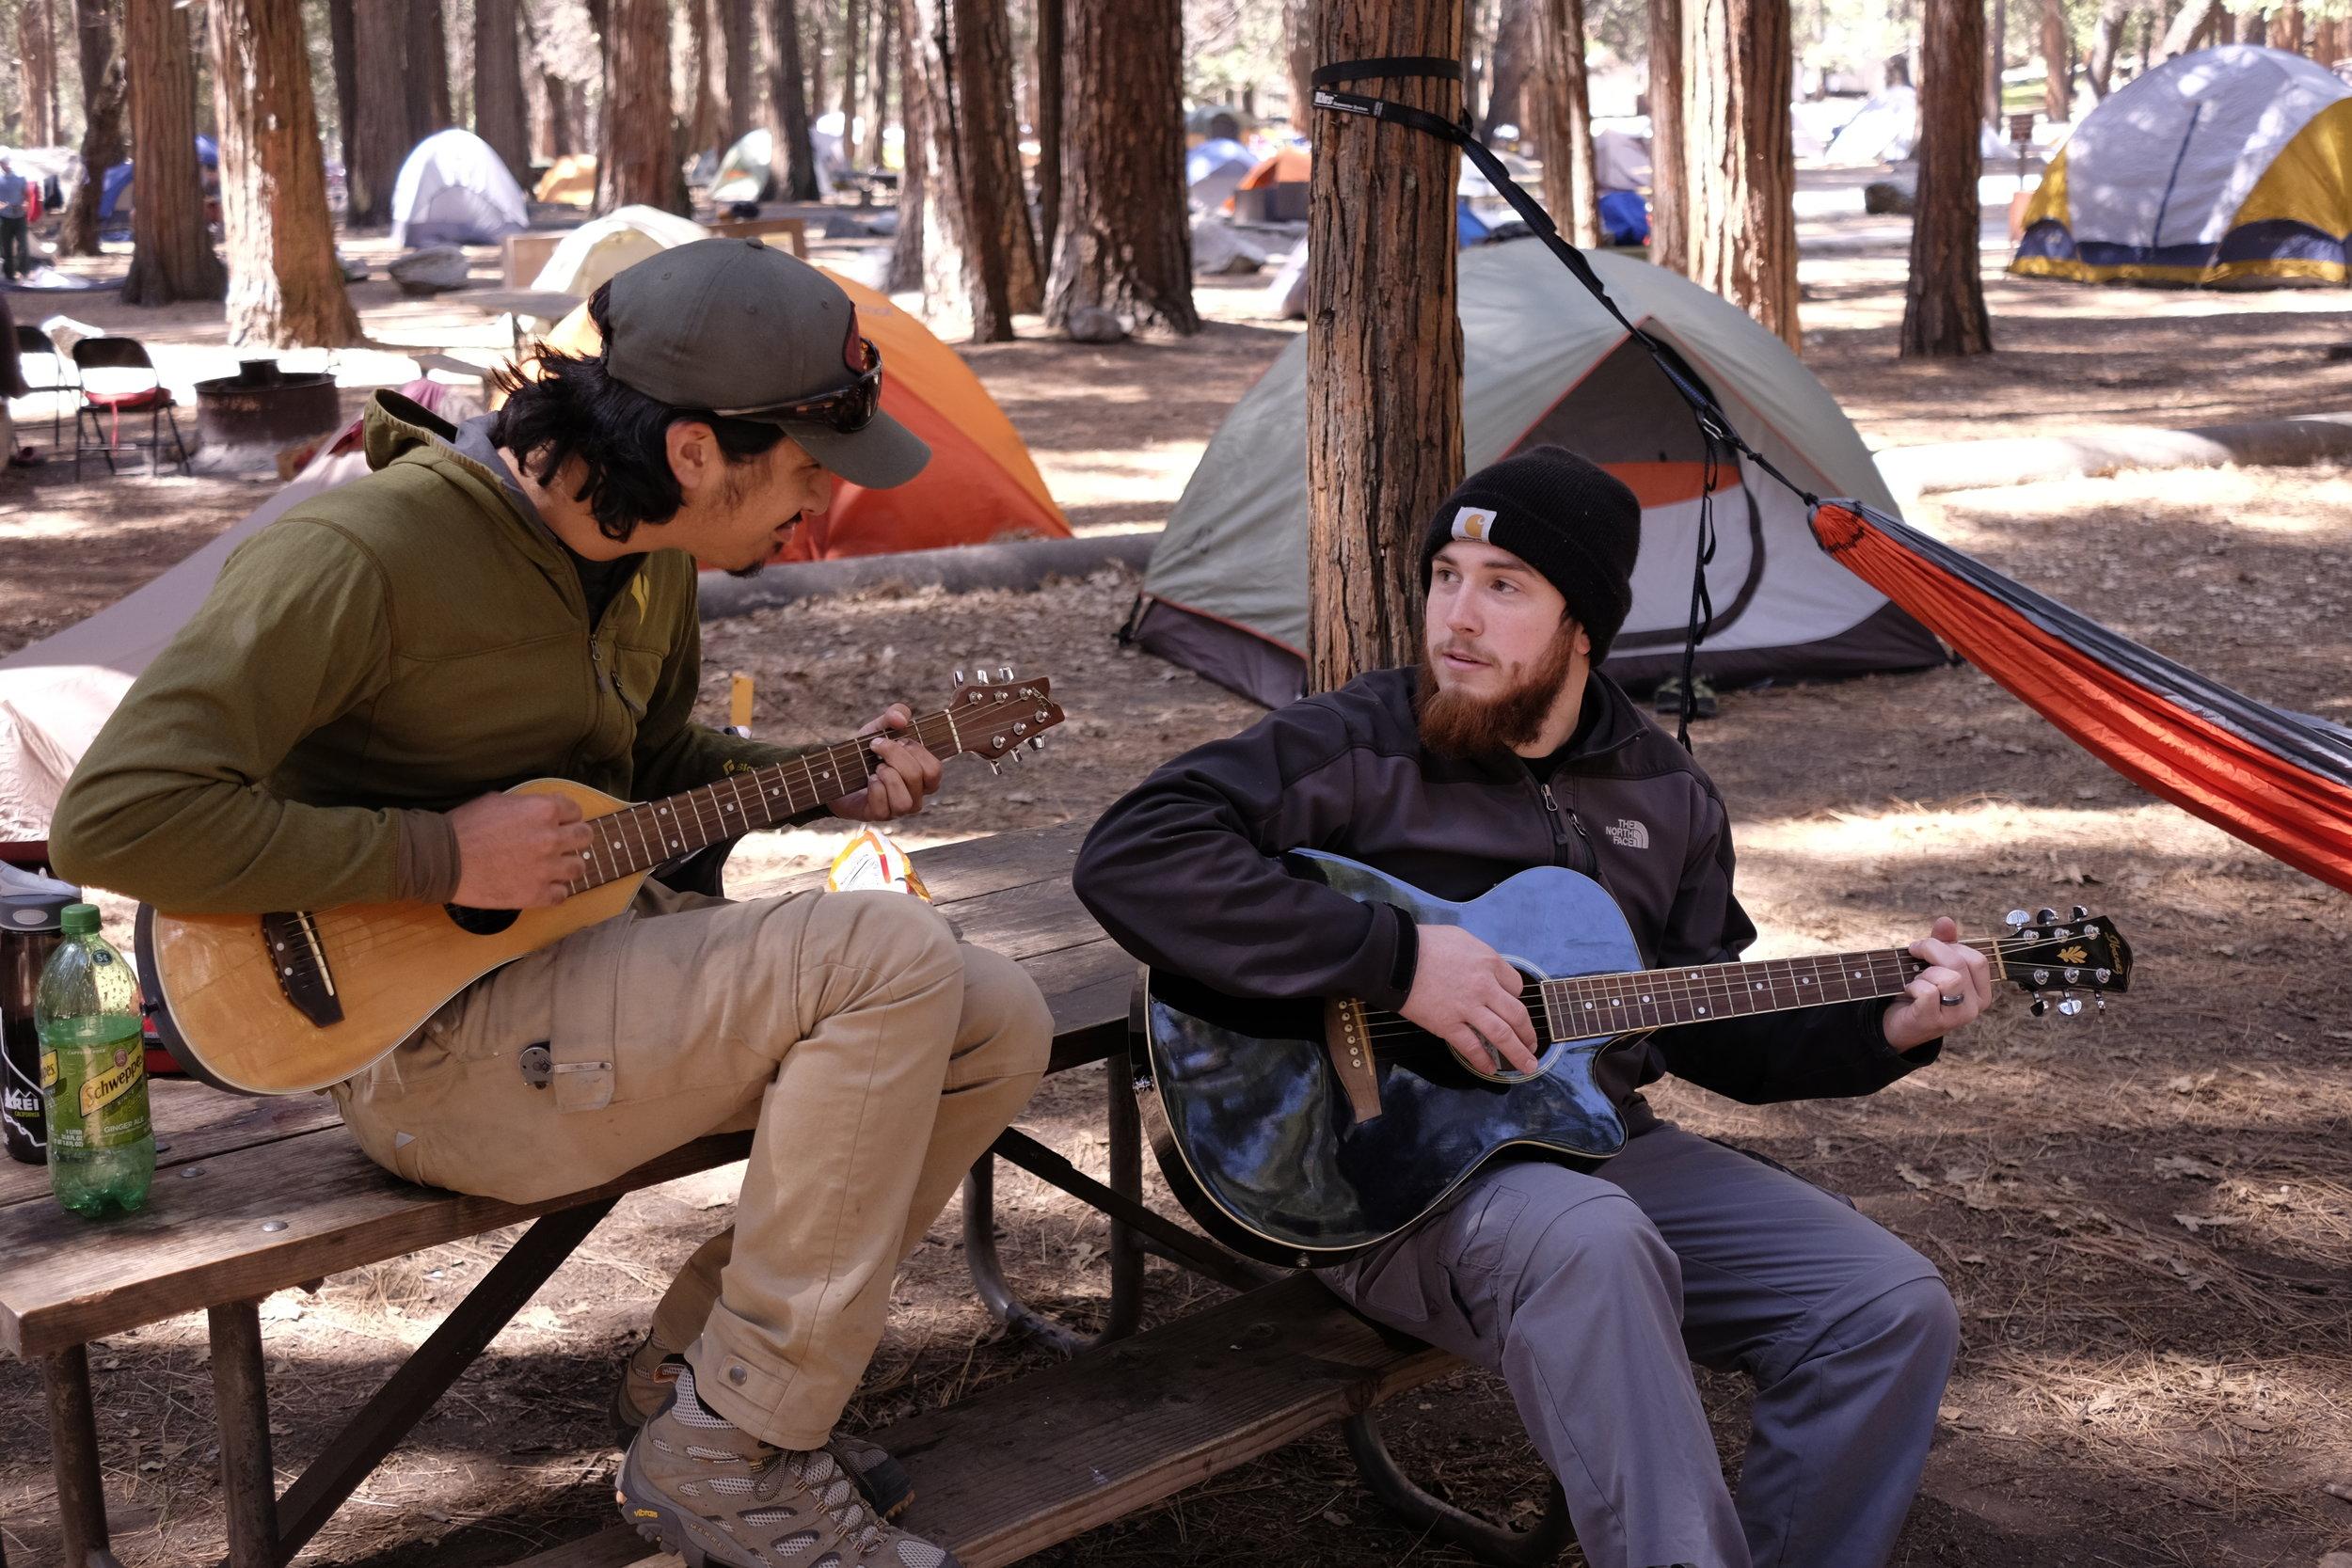 Camping at Camp 4 in Yosemite Valley